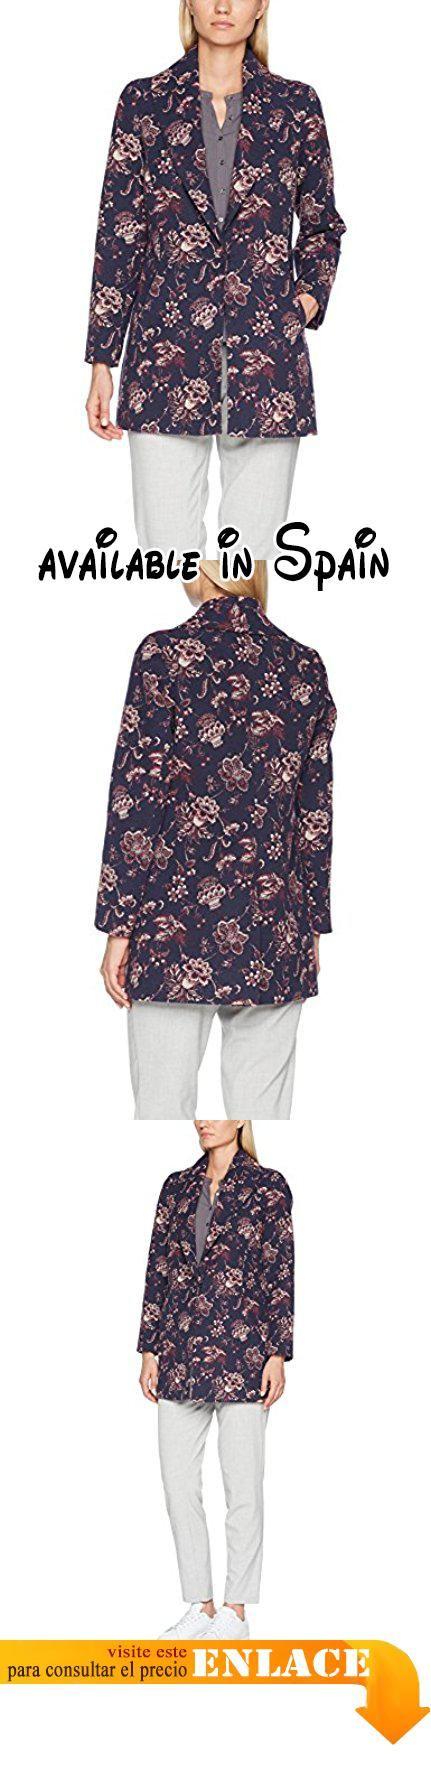 B075TF4ZBN : Trucco - Abrigo para mujer color azul oscuro talla M.